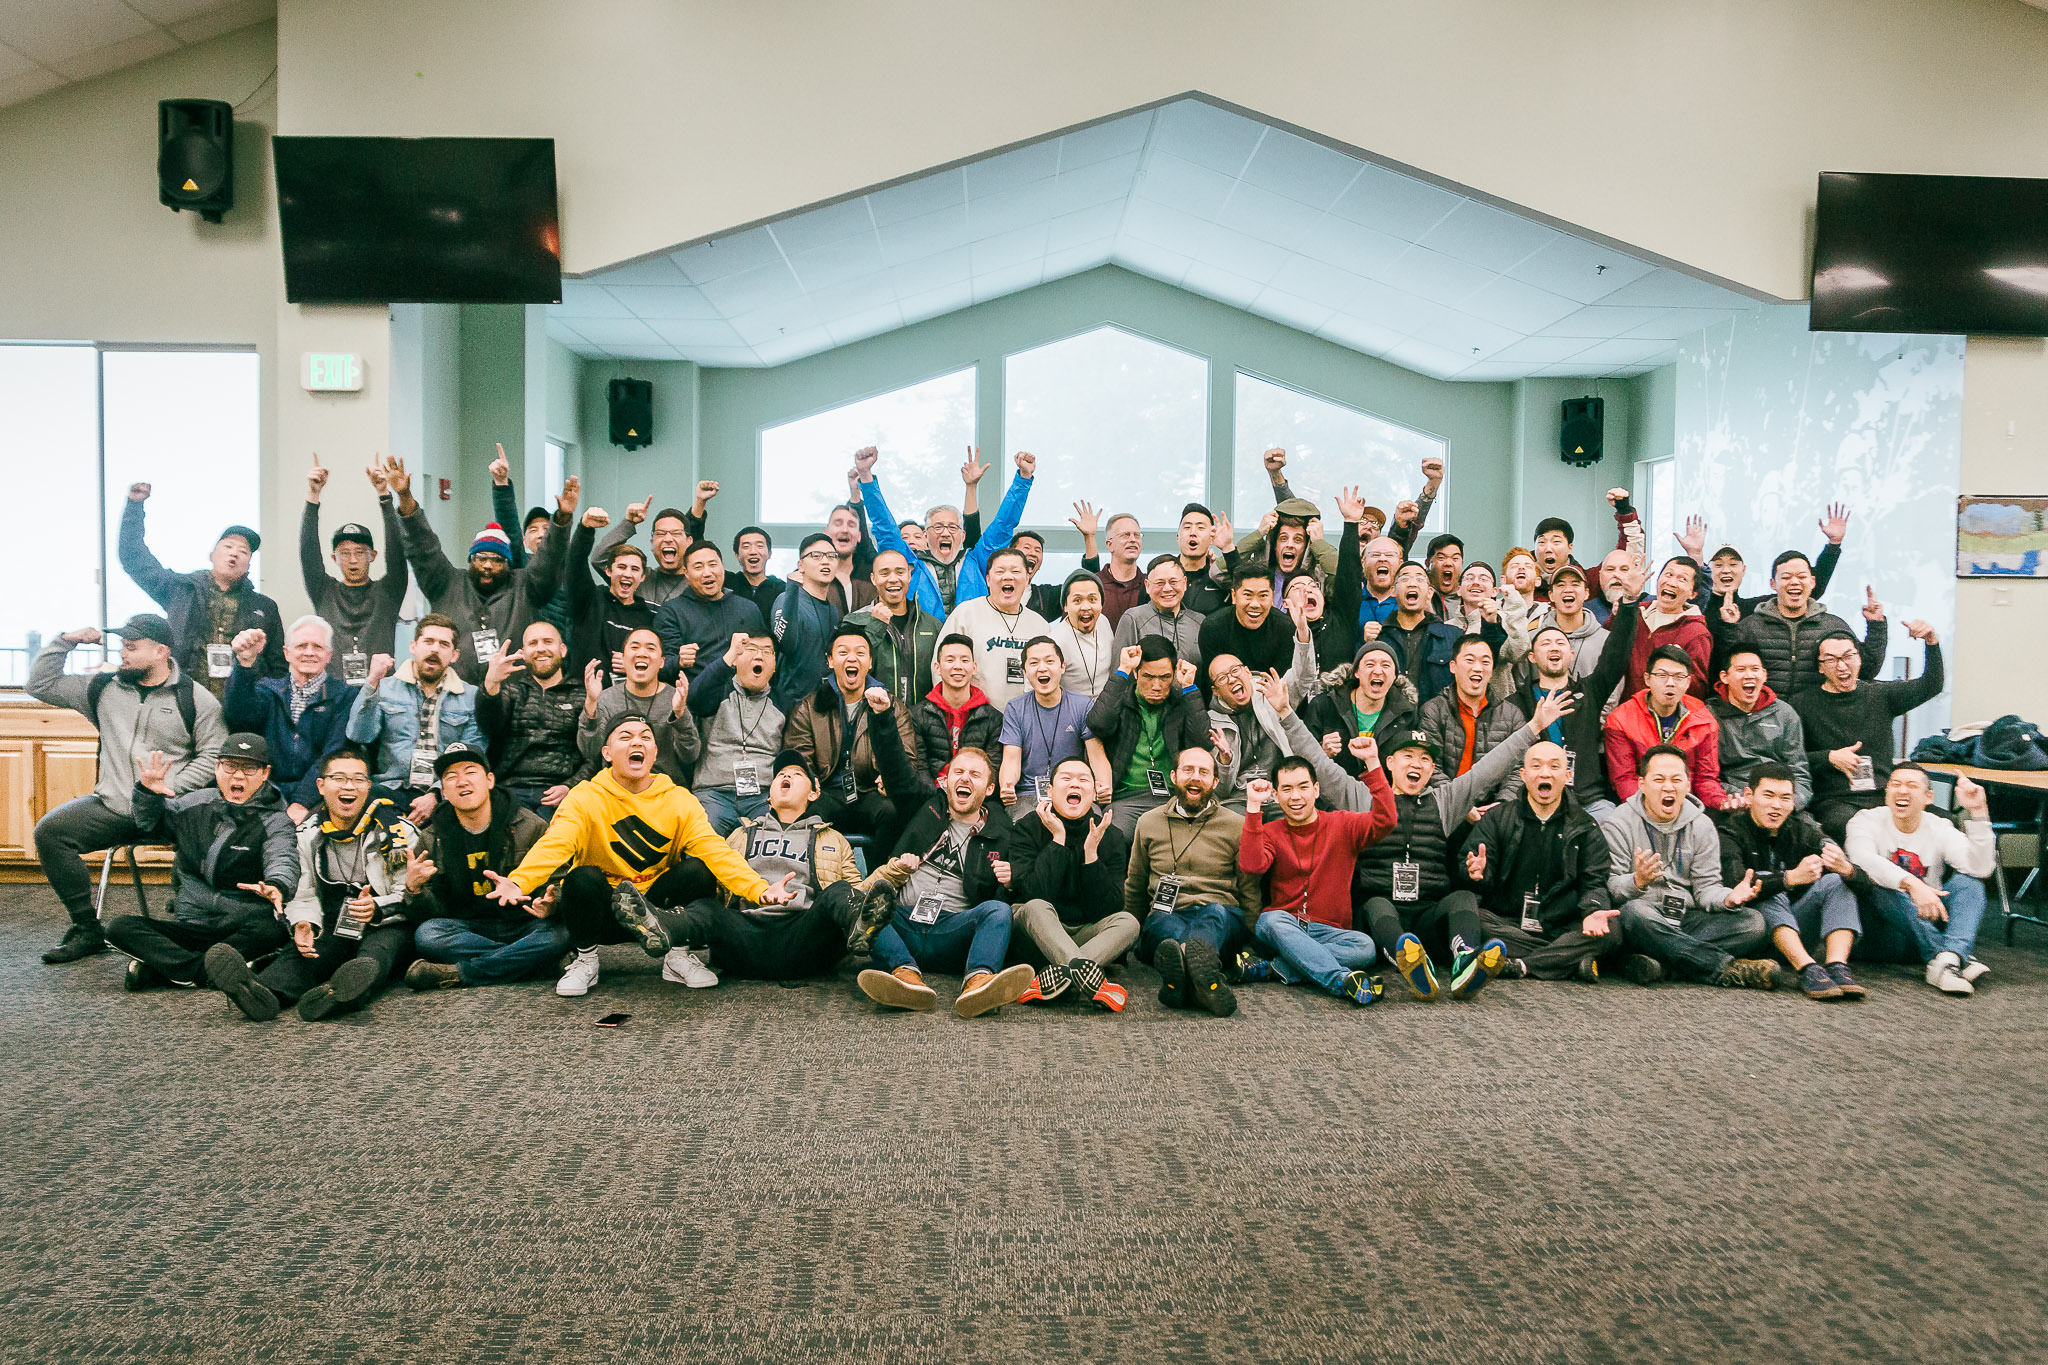 2019-03_Epicentre Men's Retreat_Group Photos (2 of 2) Social Media.JPG